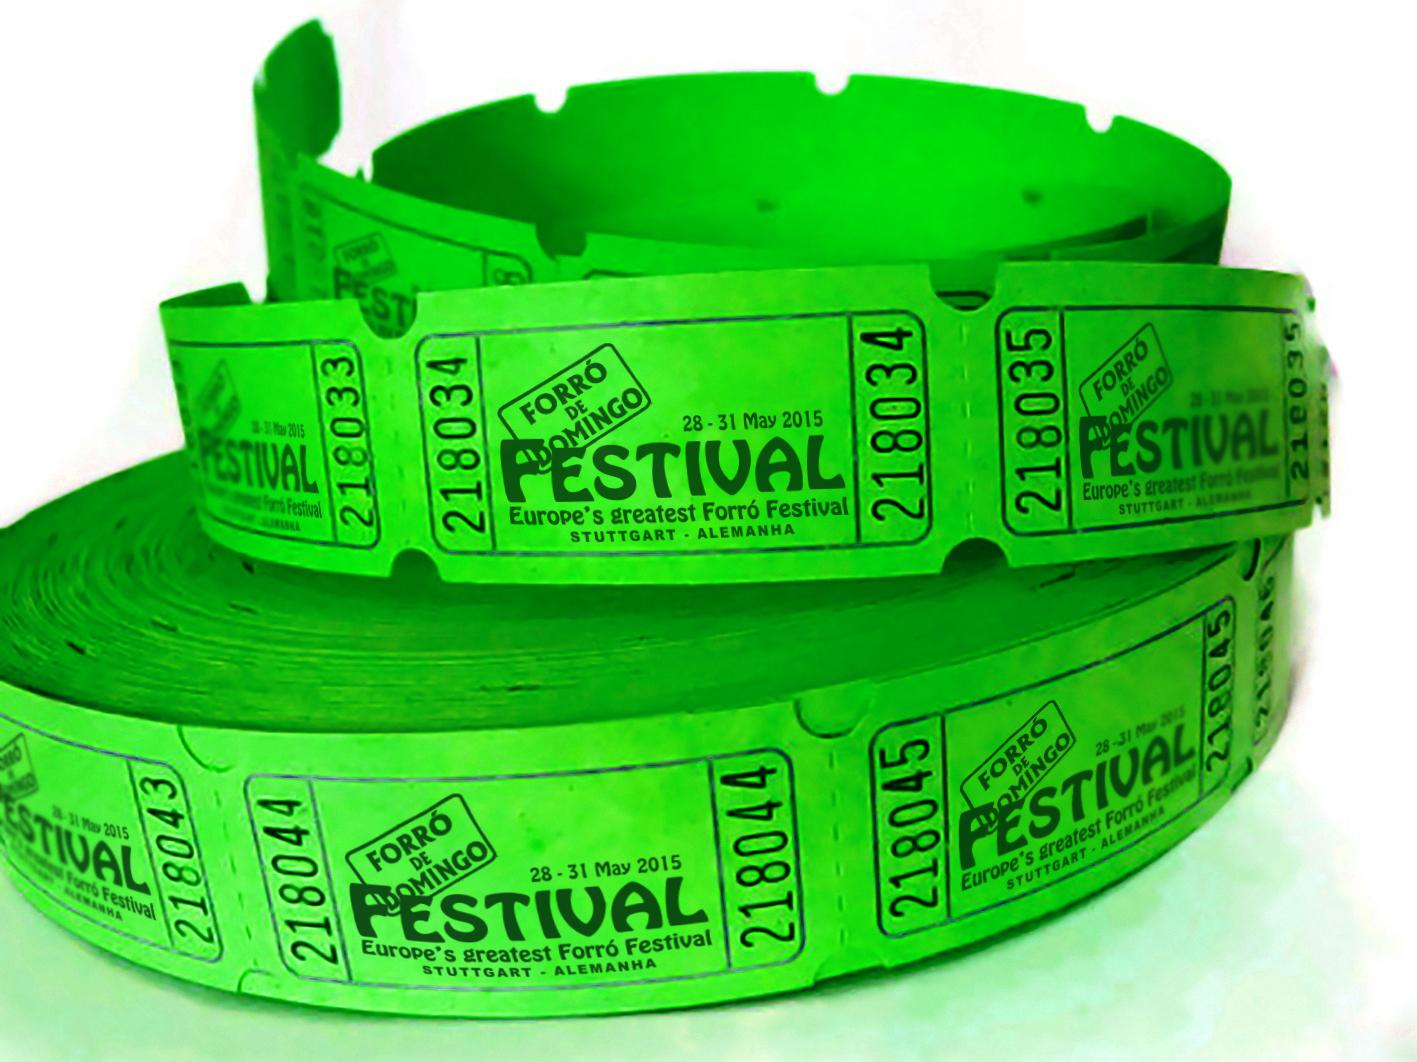 http://forrofestival.com/wp-content/uploads/2015/01/FdD-ticket_1-dia.jpg